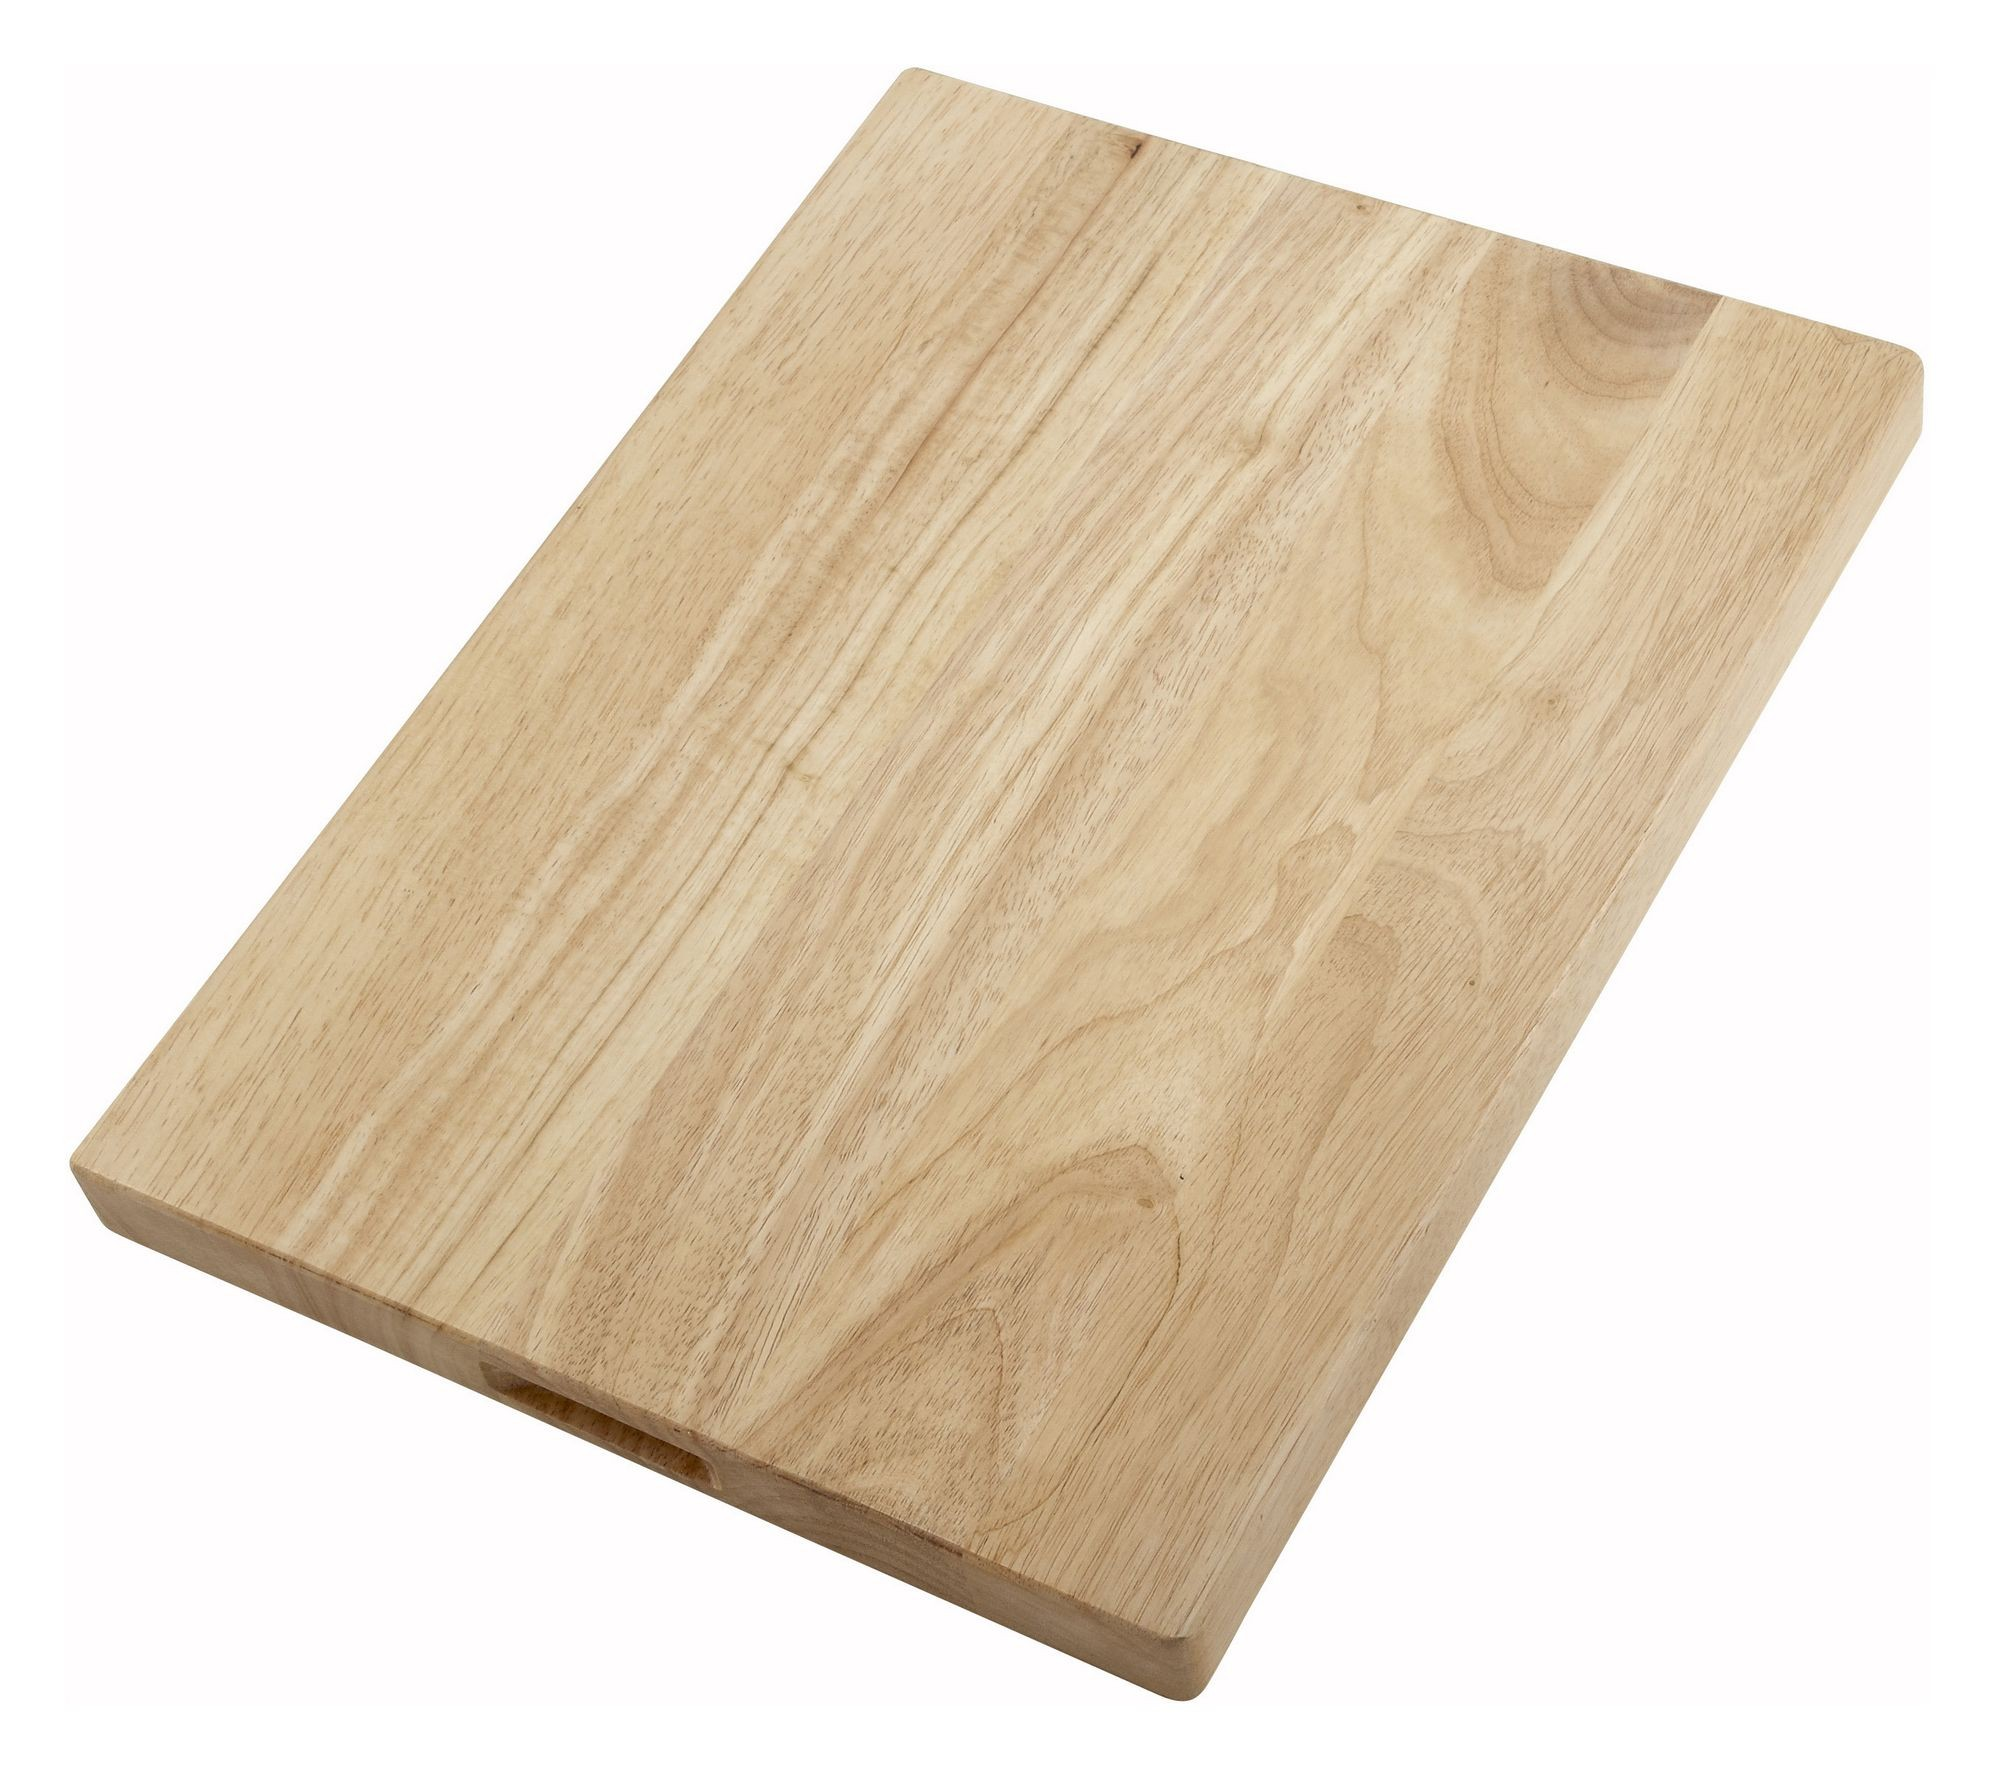 "Winco WCB-1218 Wood Cutting Board 12"" x 18"" x 1-3/4"" Thick"